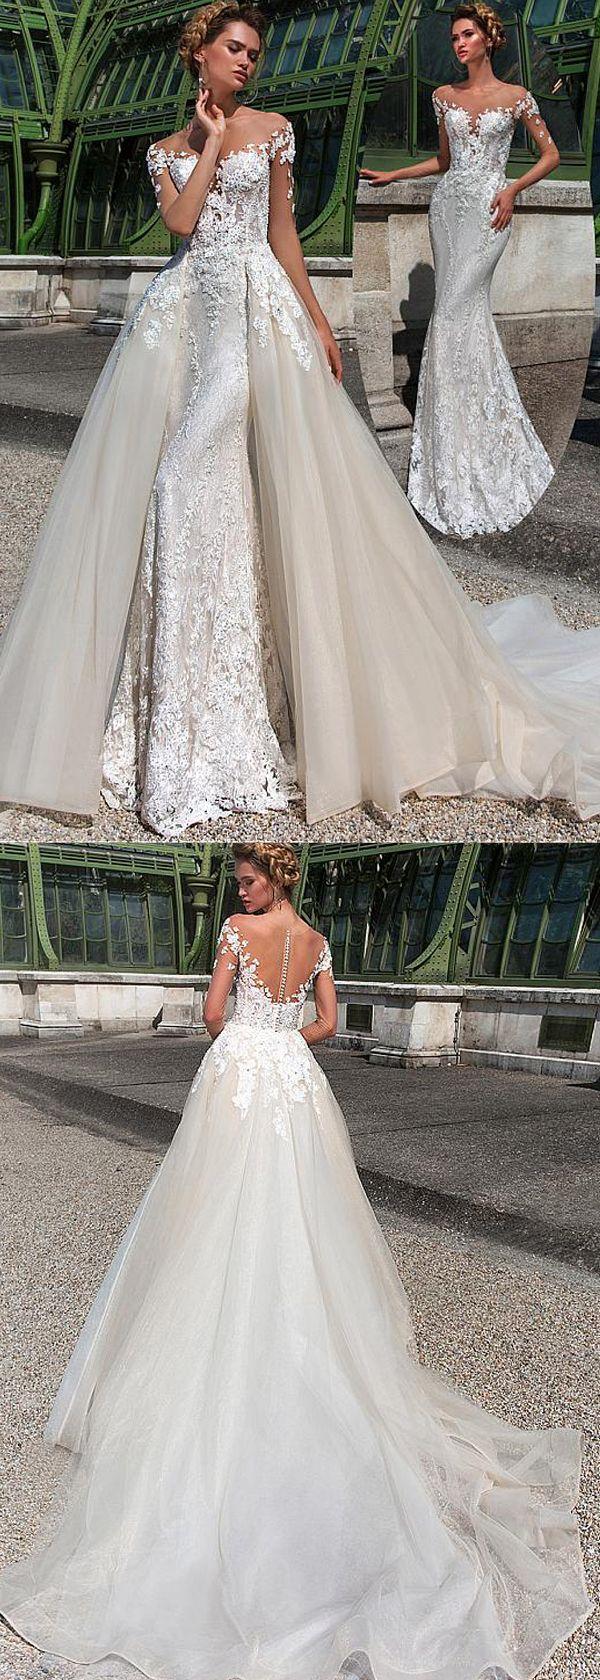 Fascinating Tulle & Lace Sheer Jewel Neckline 2 In 1 Wedding Dress ...